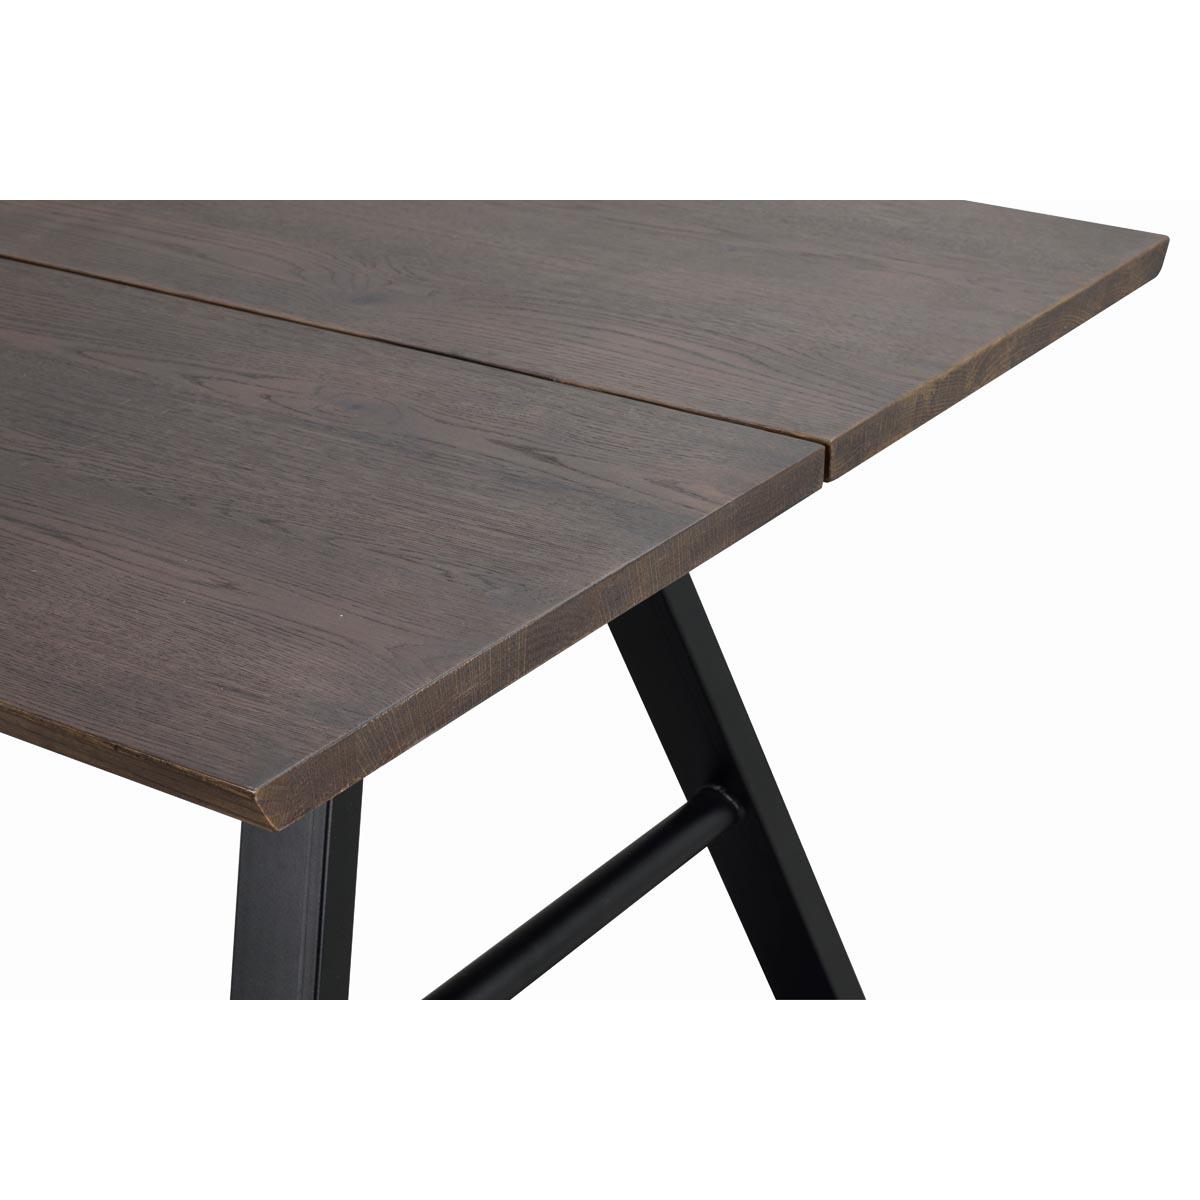 Brigham-matbord-brun-ekR-119401_det2